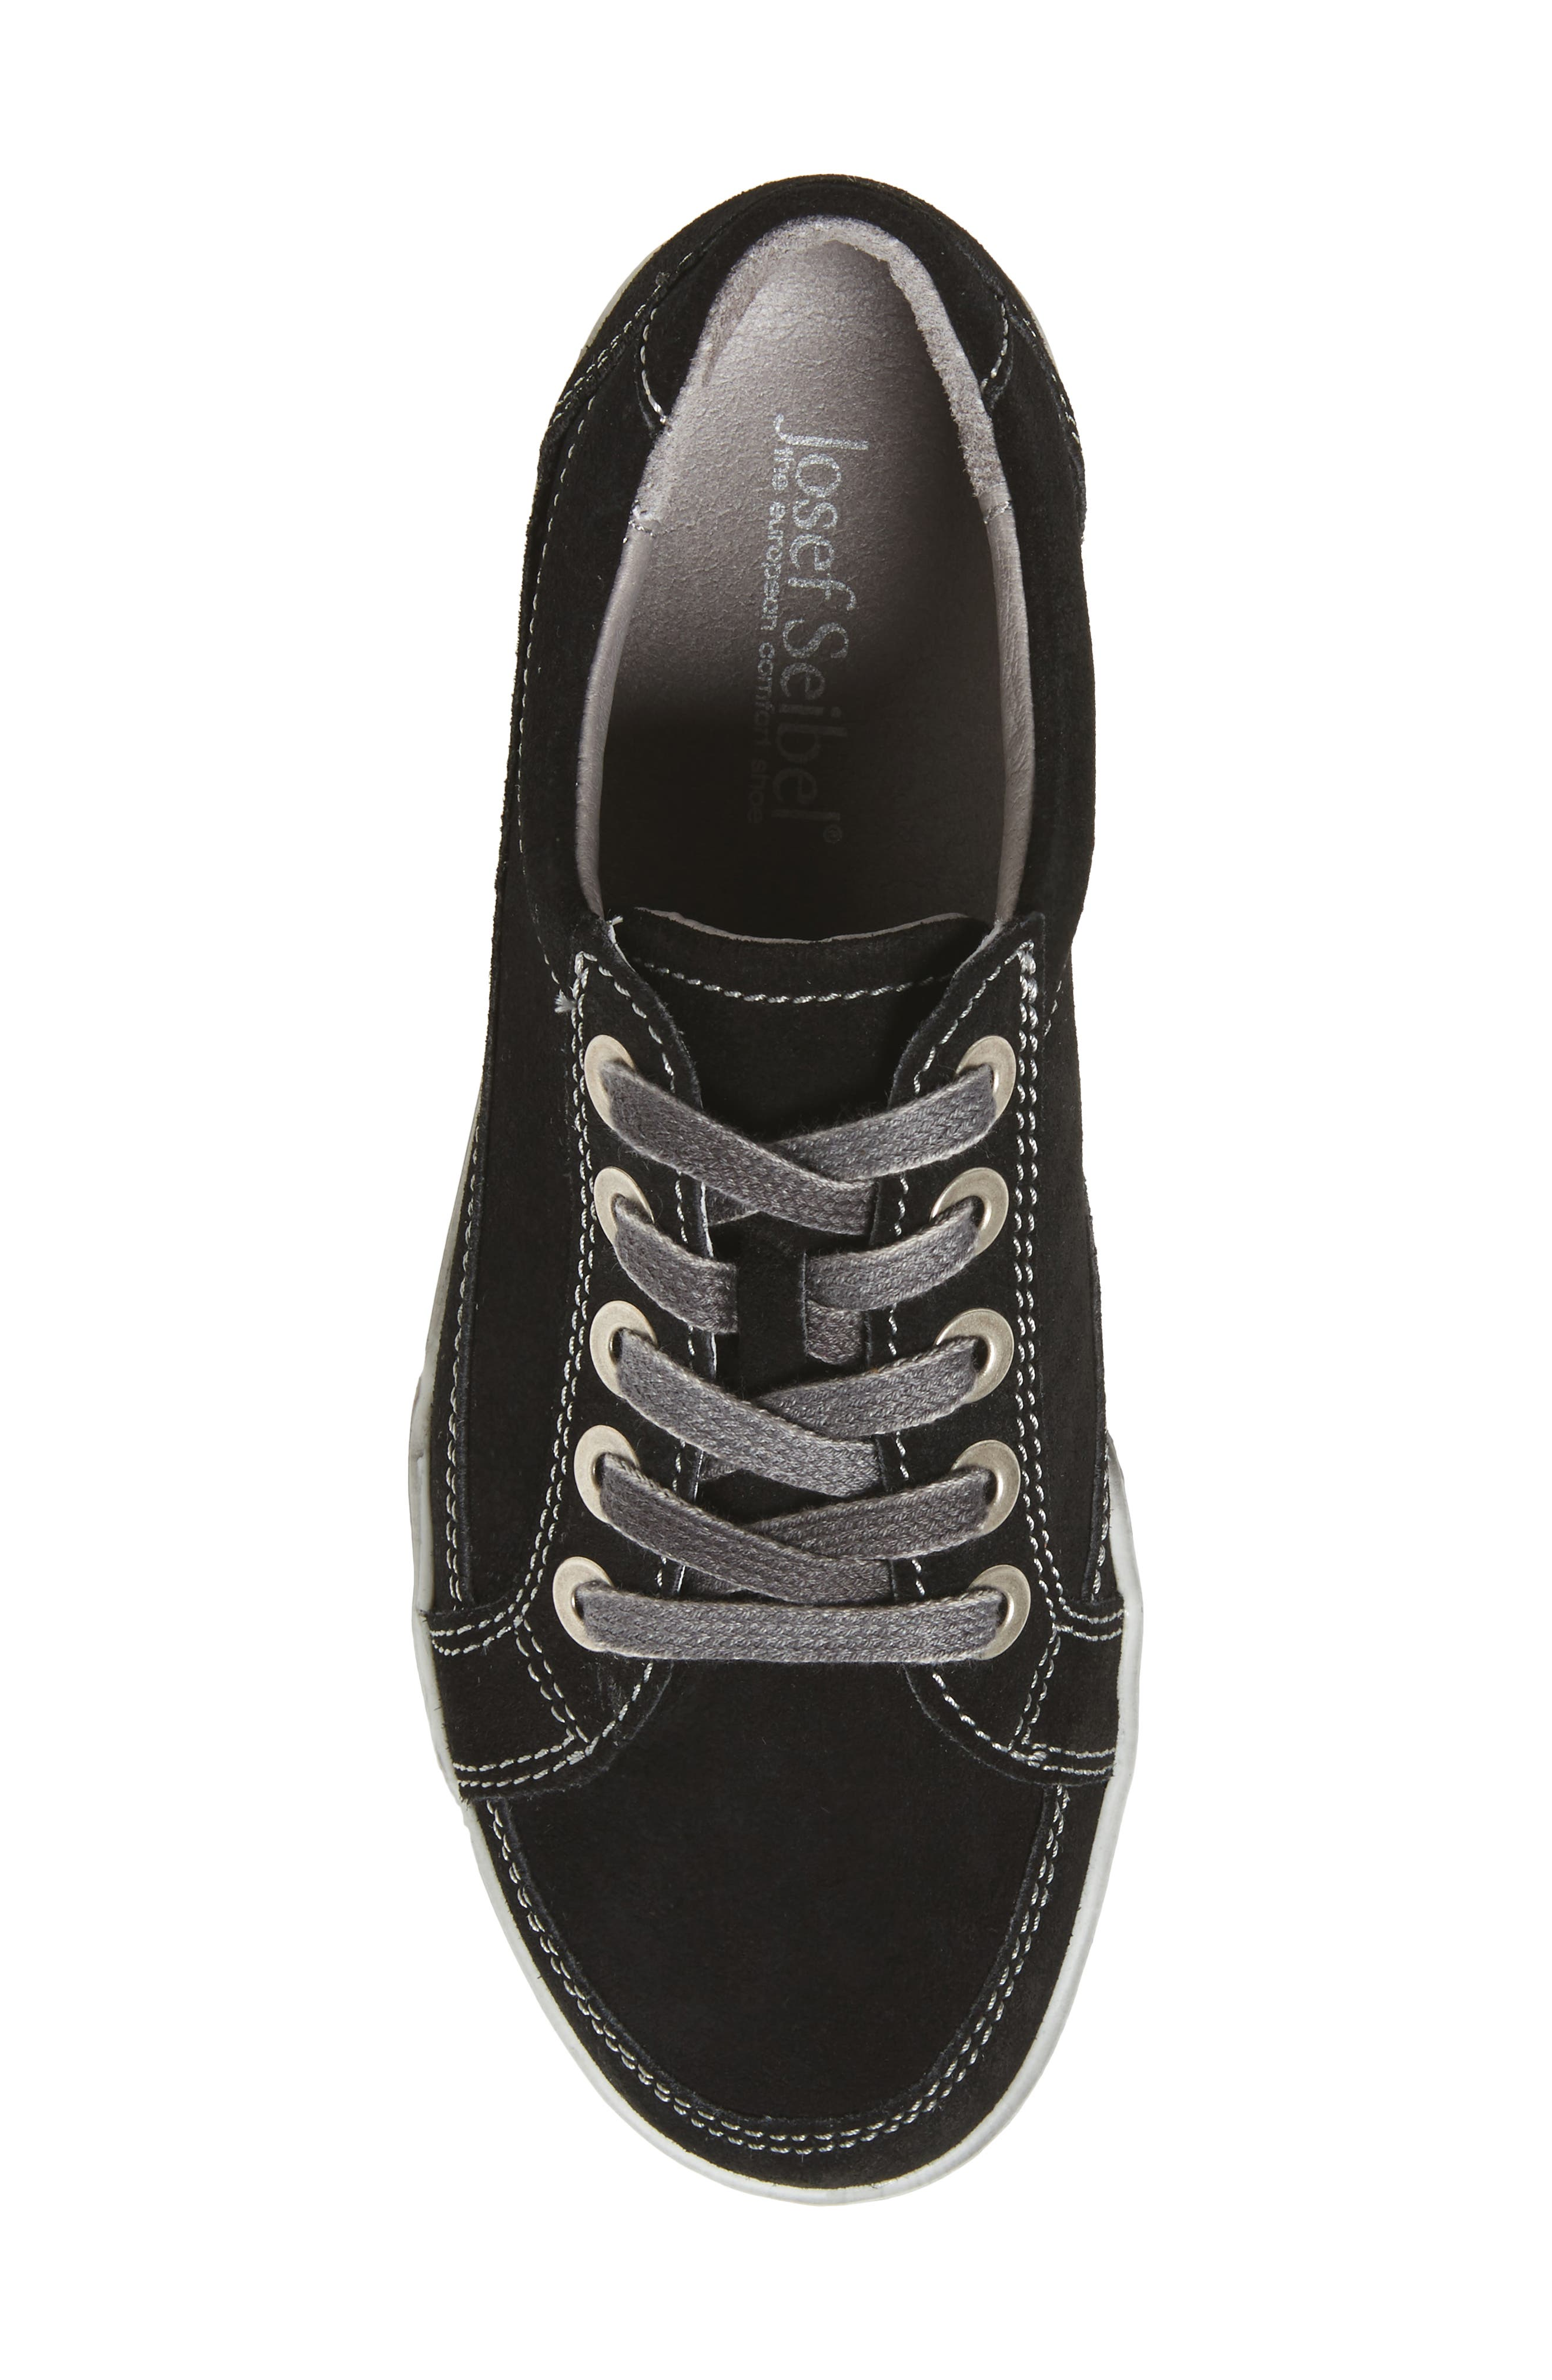 Dany 57 Sneaker,                             Alternate thumbnail 4, color,                             Black Leather